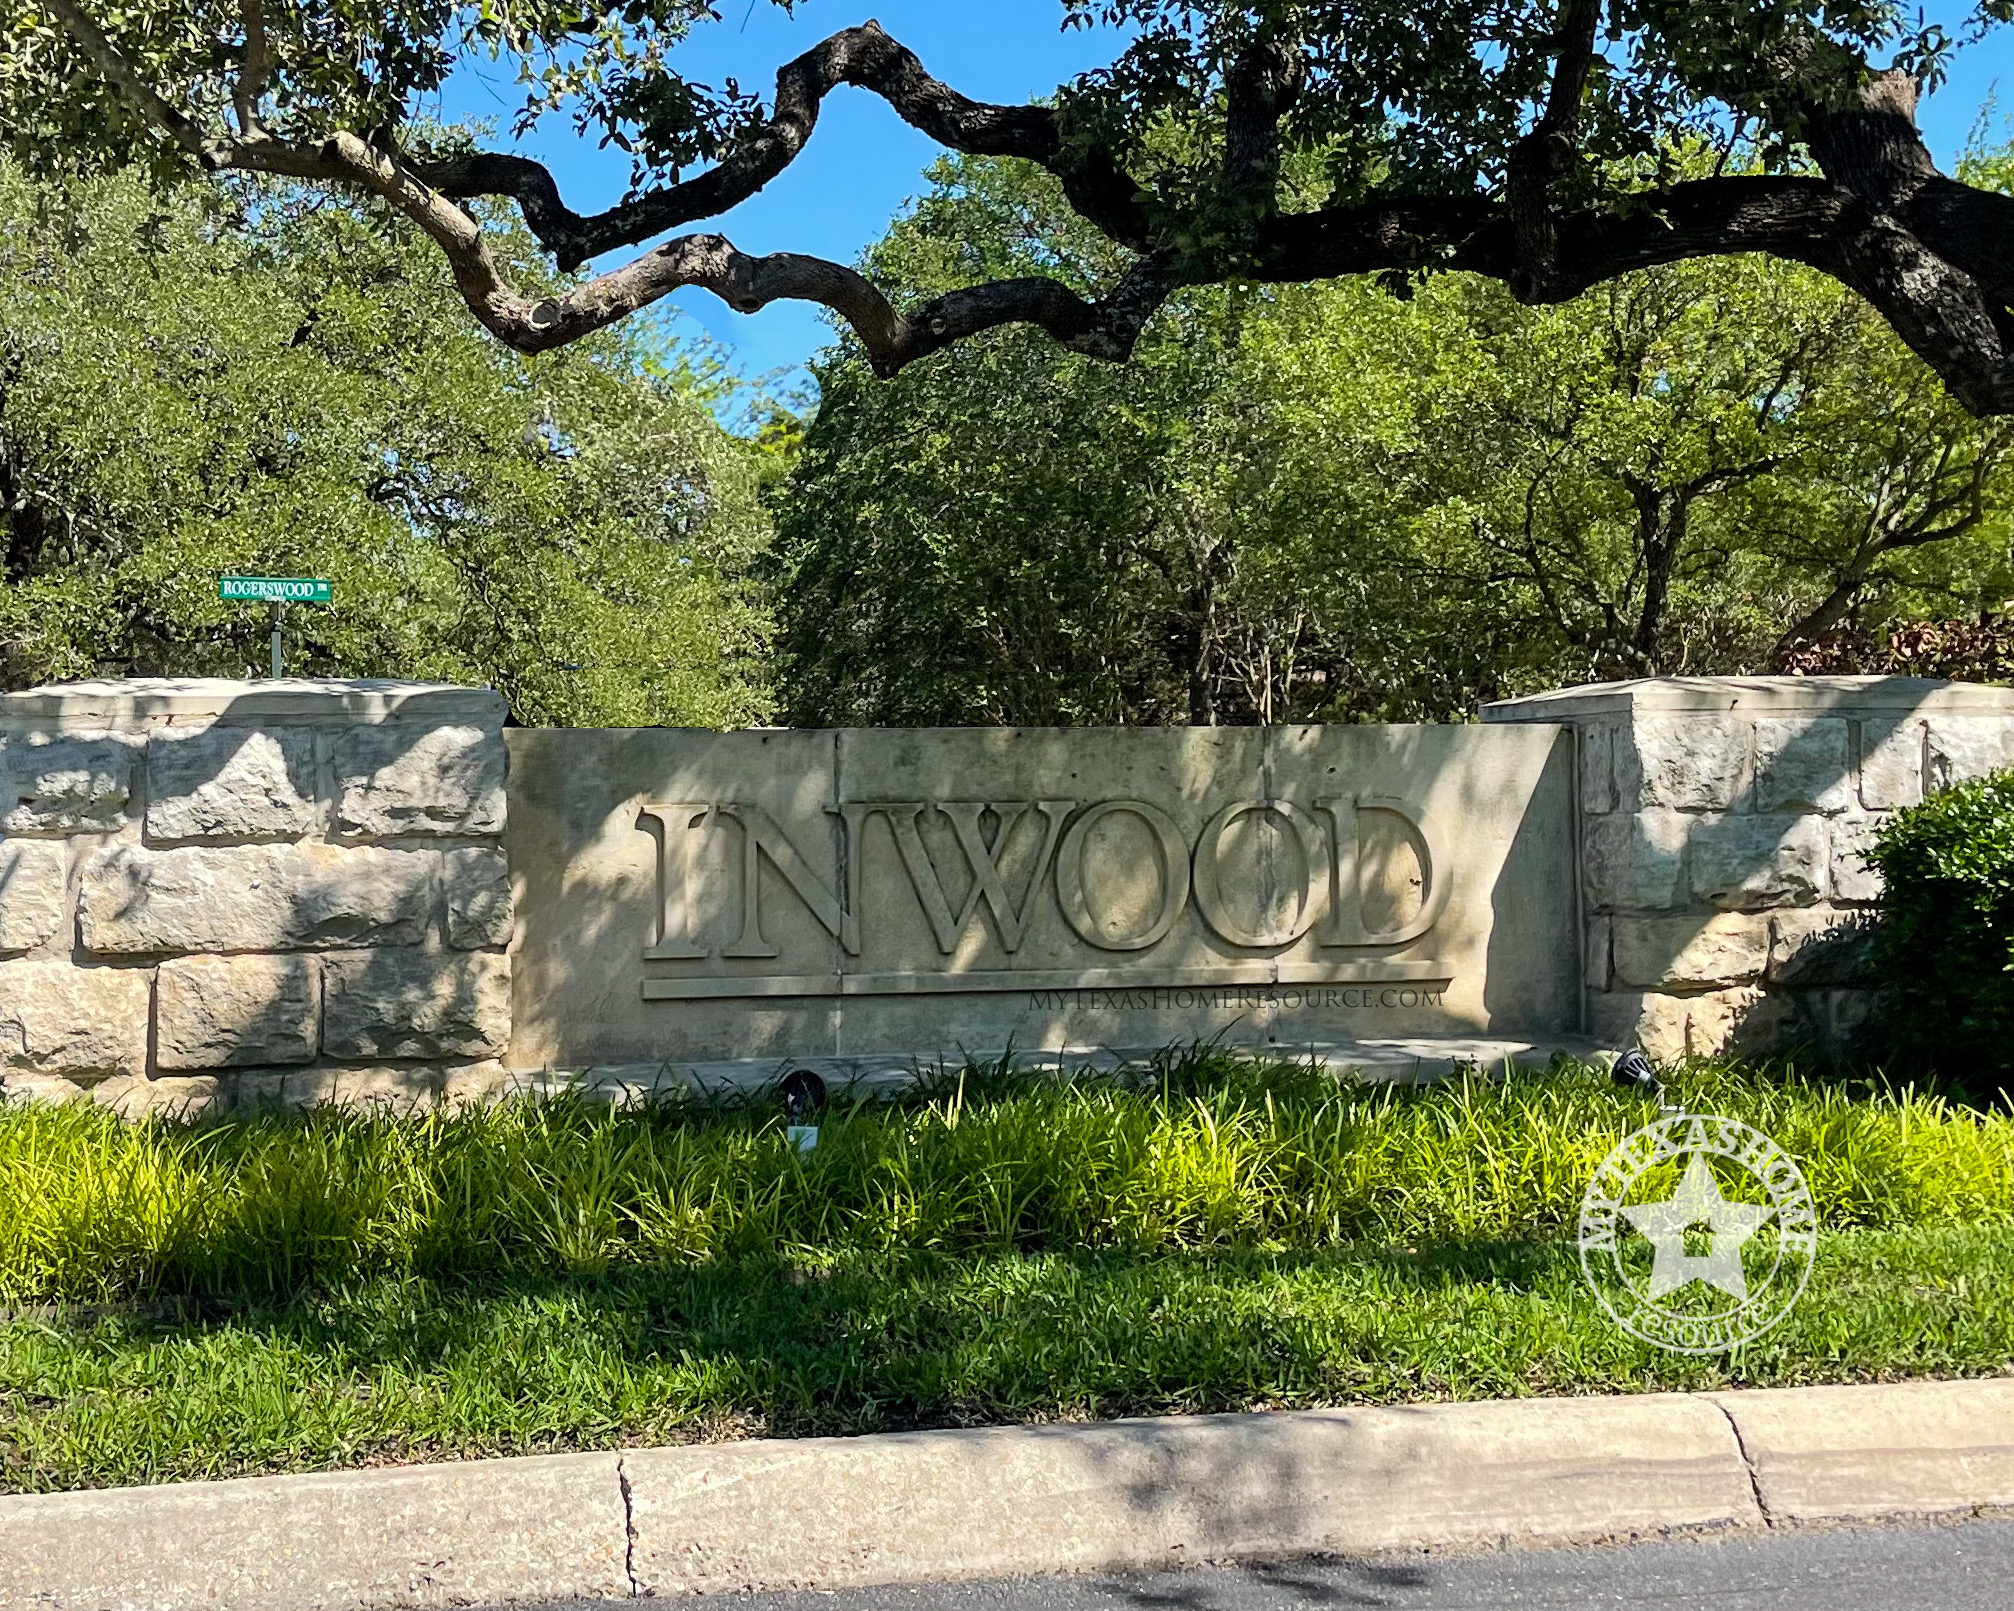 Inwood Community San Antonio, TX